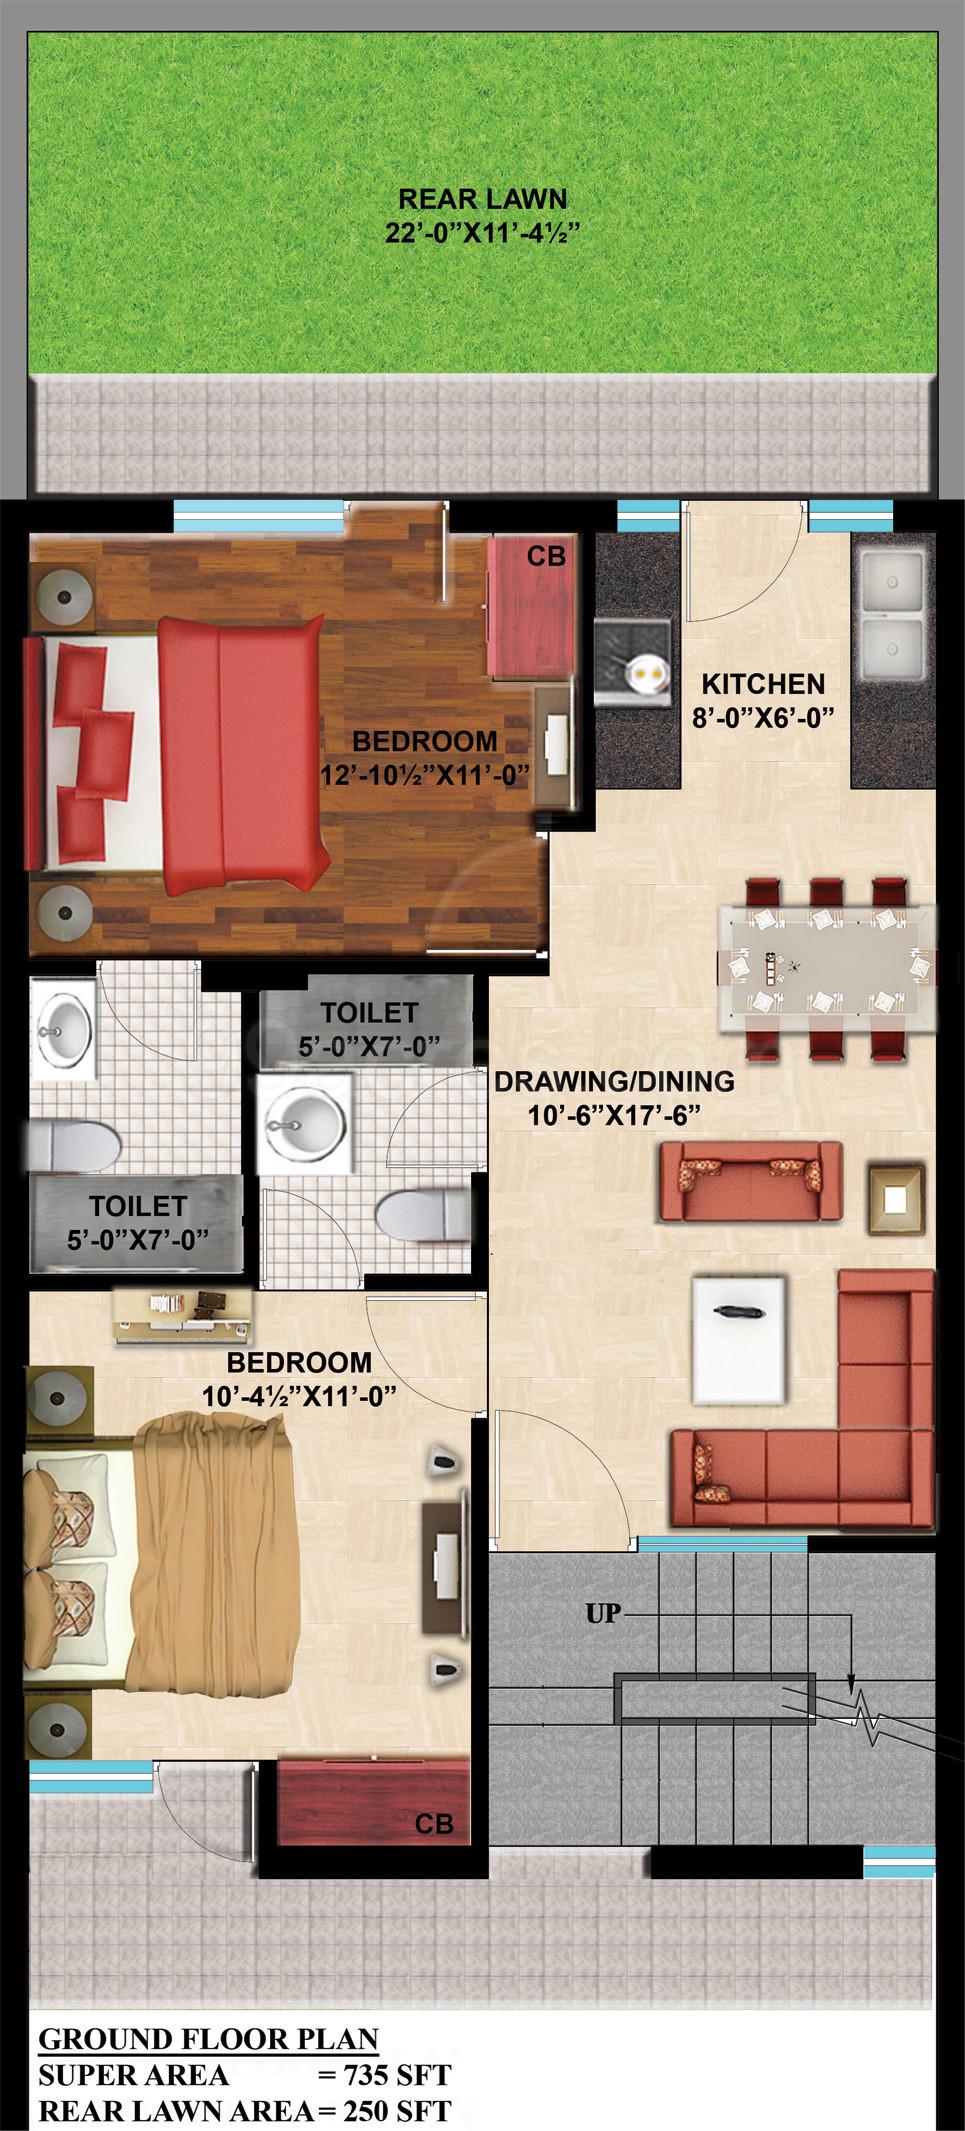 GBP Group GBP Rosewood Estate Floor Plan GBP Rosewood Estate